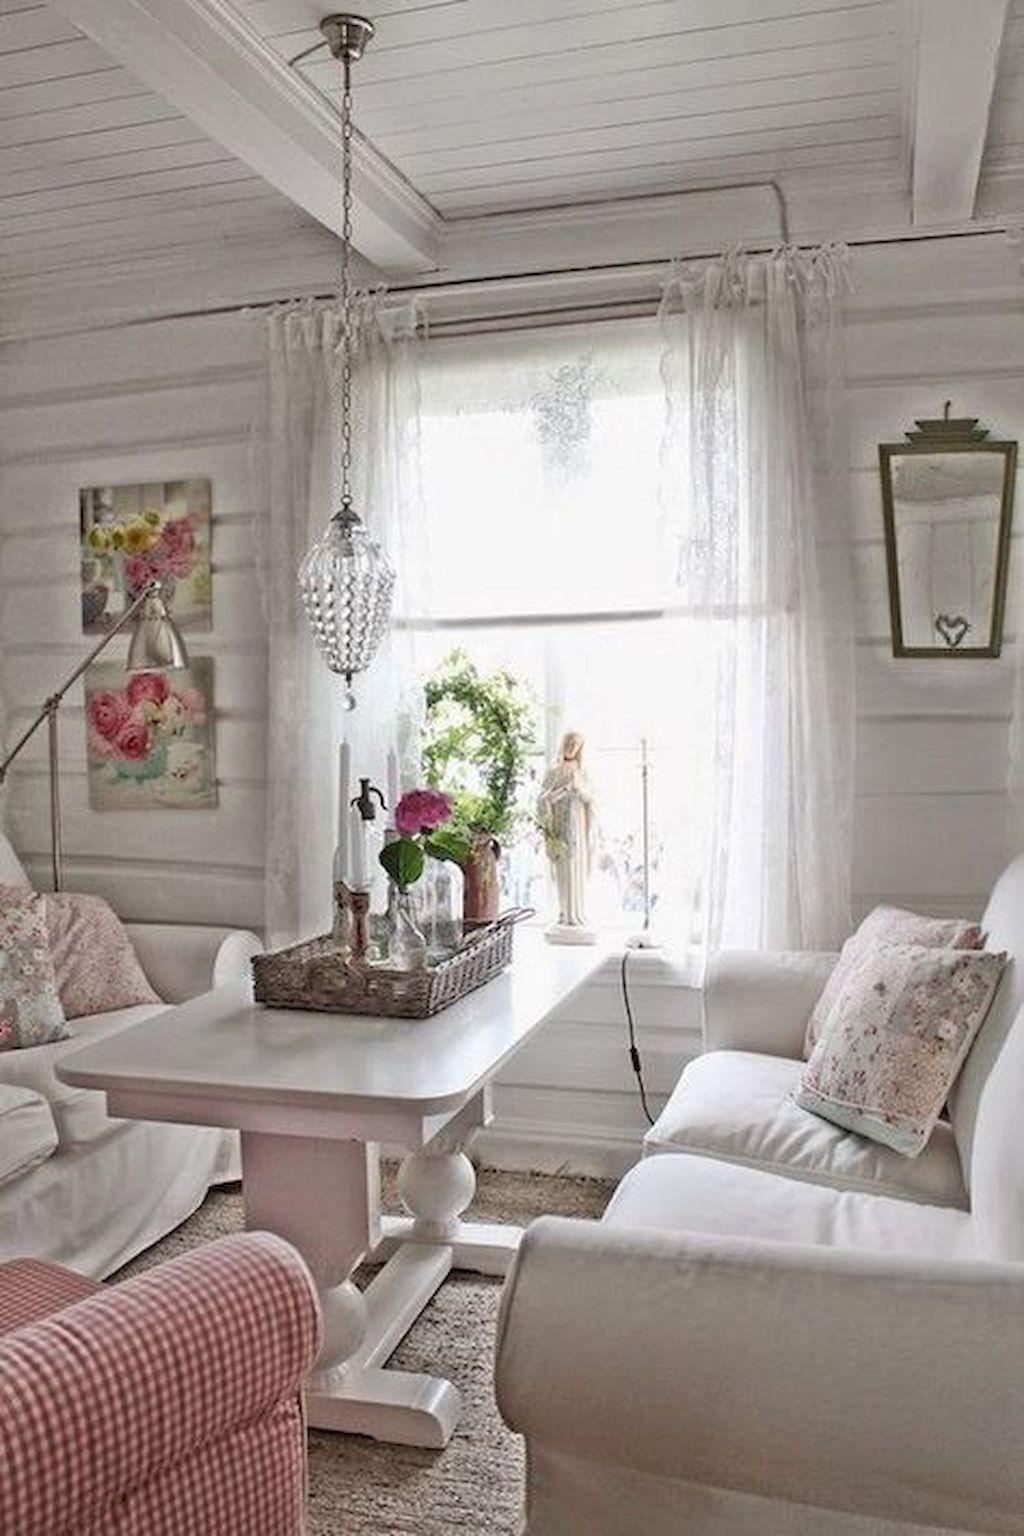 Awesome 80 Shabby Chic Farmhouse Living Room Decor Ideas https ...